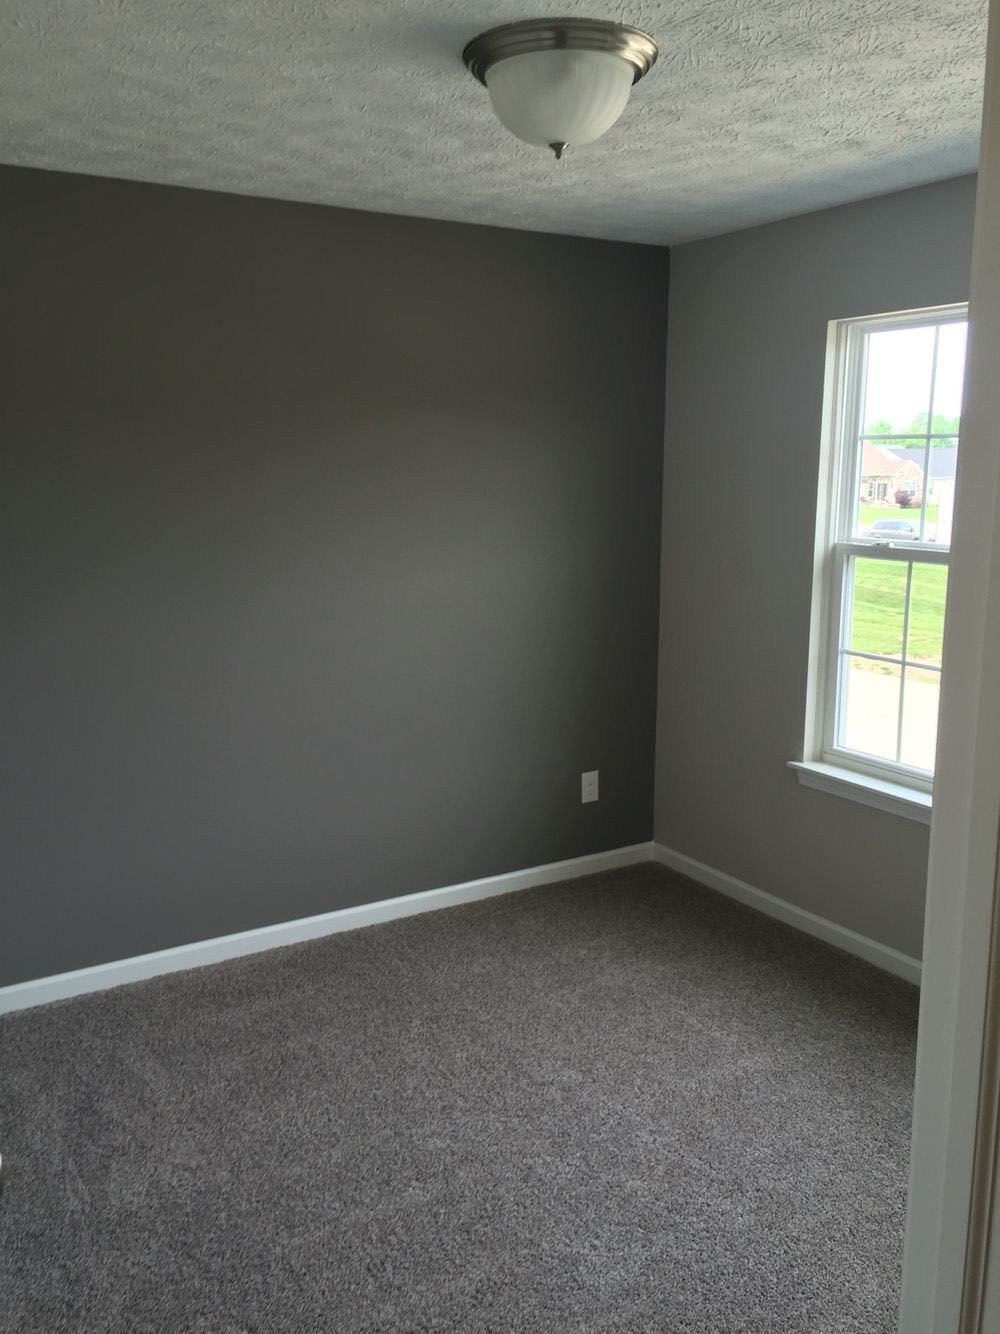 30 Modern Bedroom Carpet Ideas Inspiration Design Carpet Style Is Part Of Grey Carpet L Charcoal Grey Bedrooms Grey Carpet Bedroom Grey Carpet Living Room